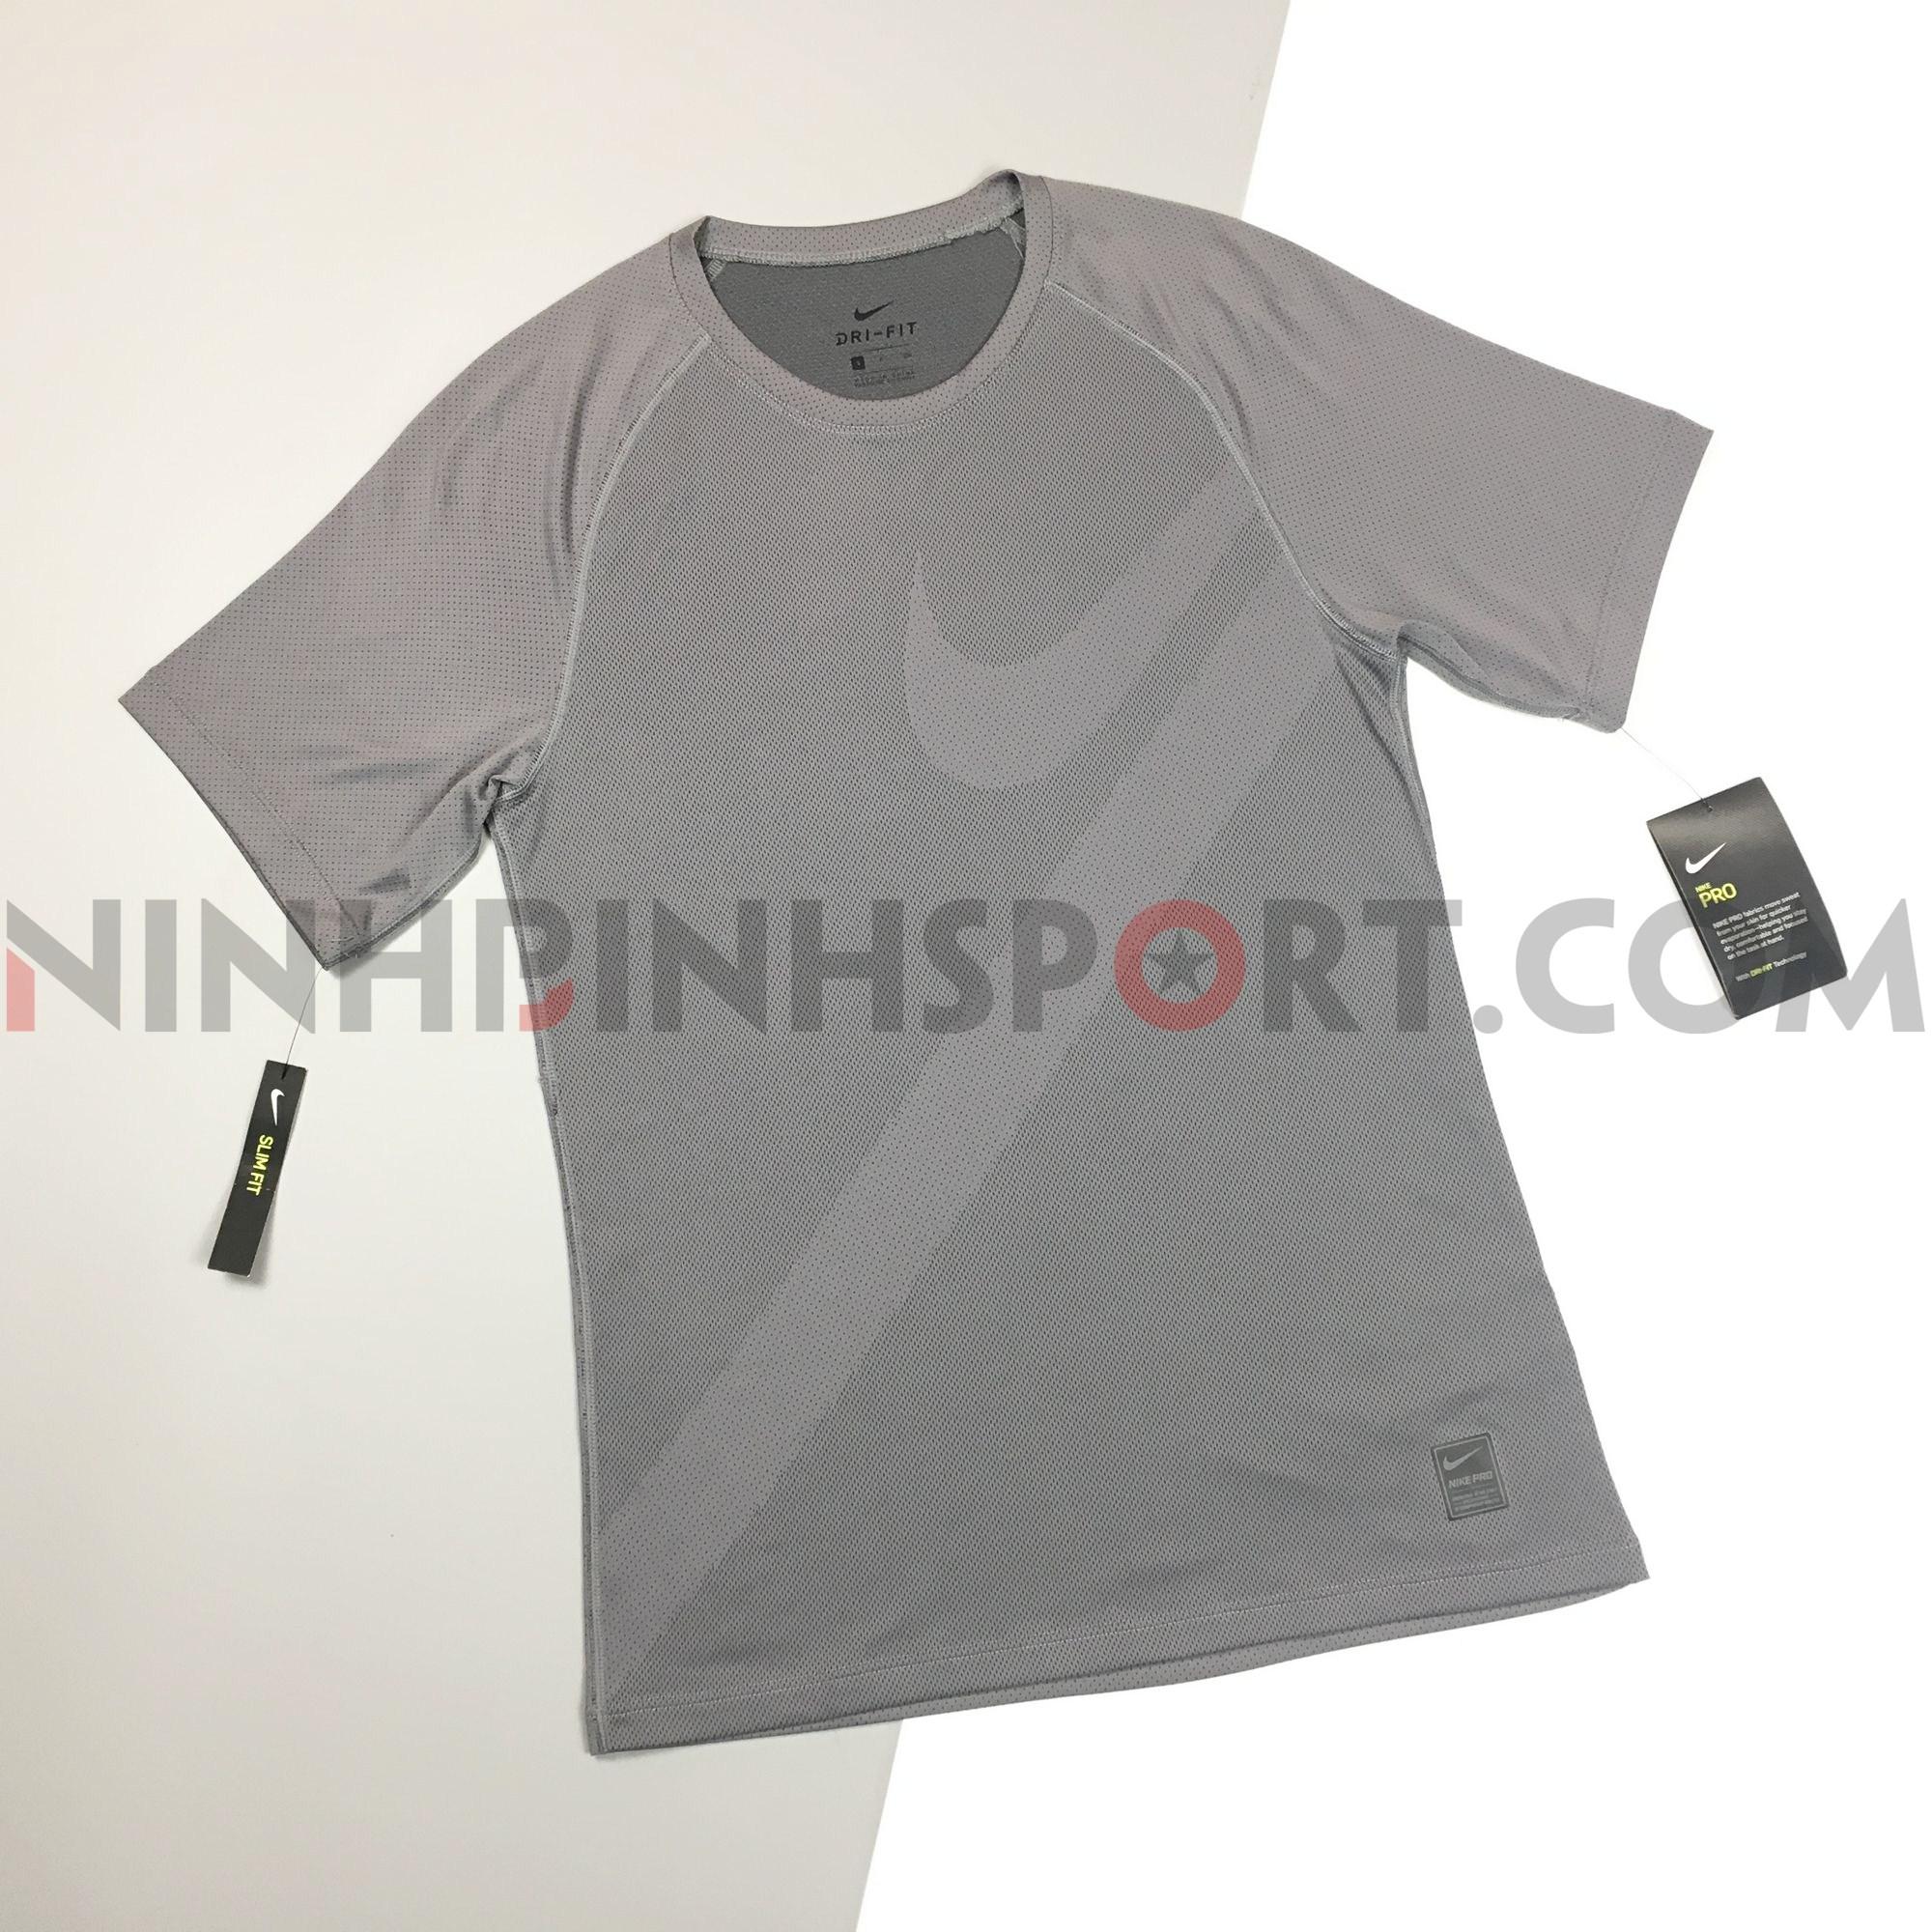 Áo thể thao nam Nike Pro Top AJ8851-056